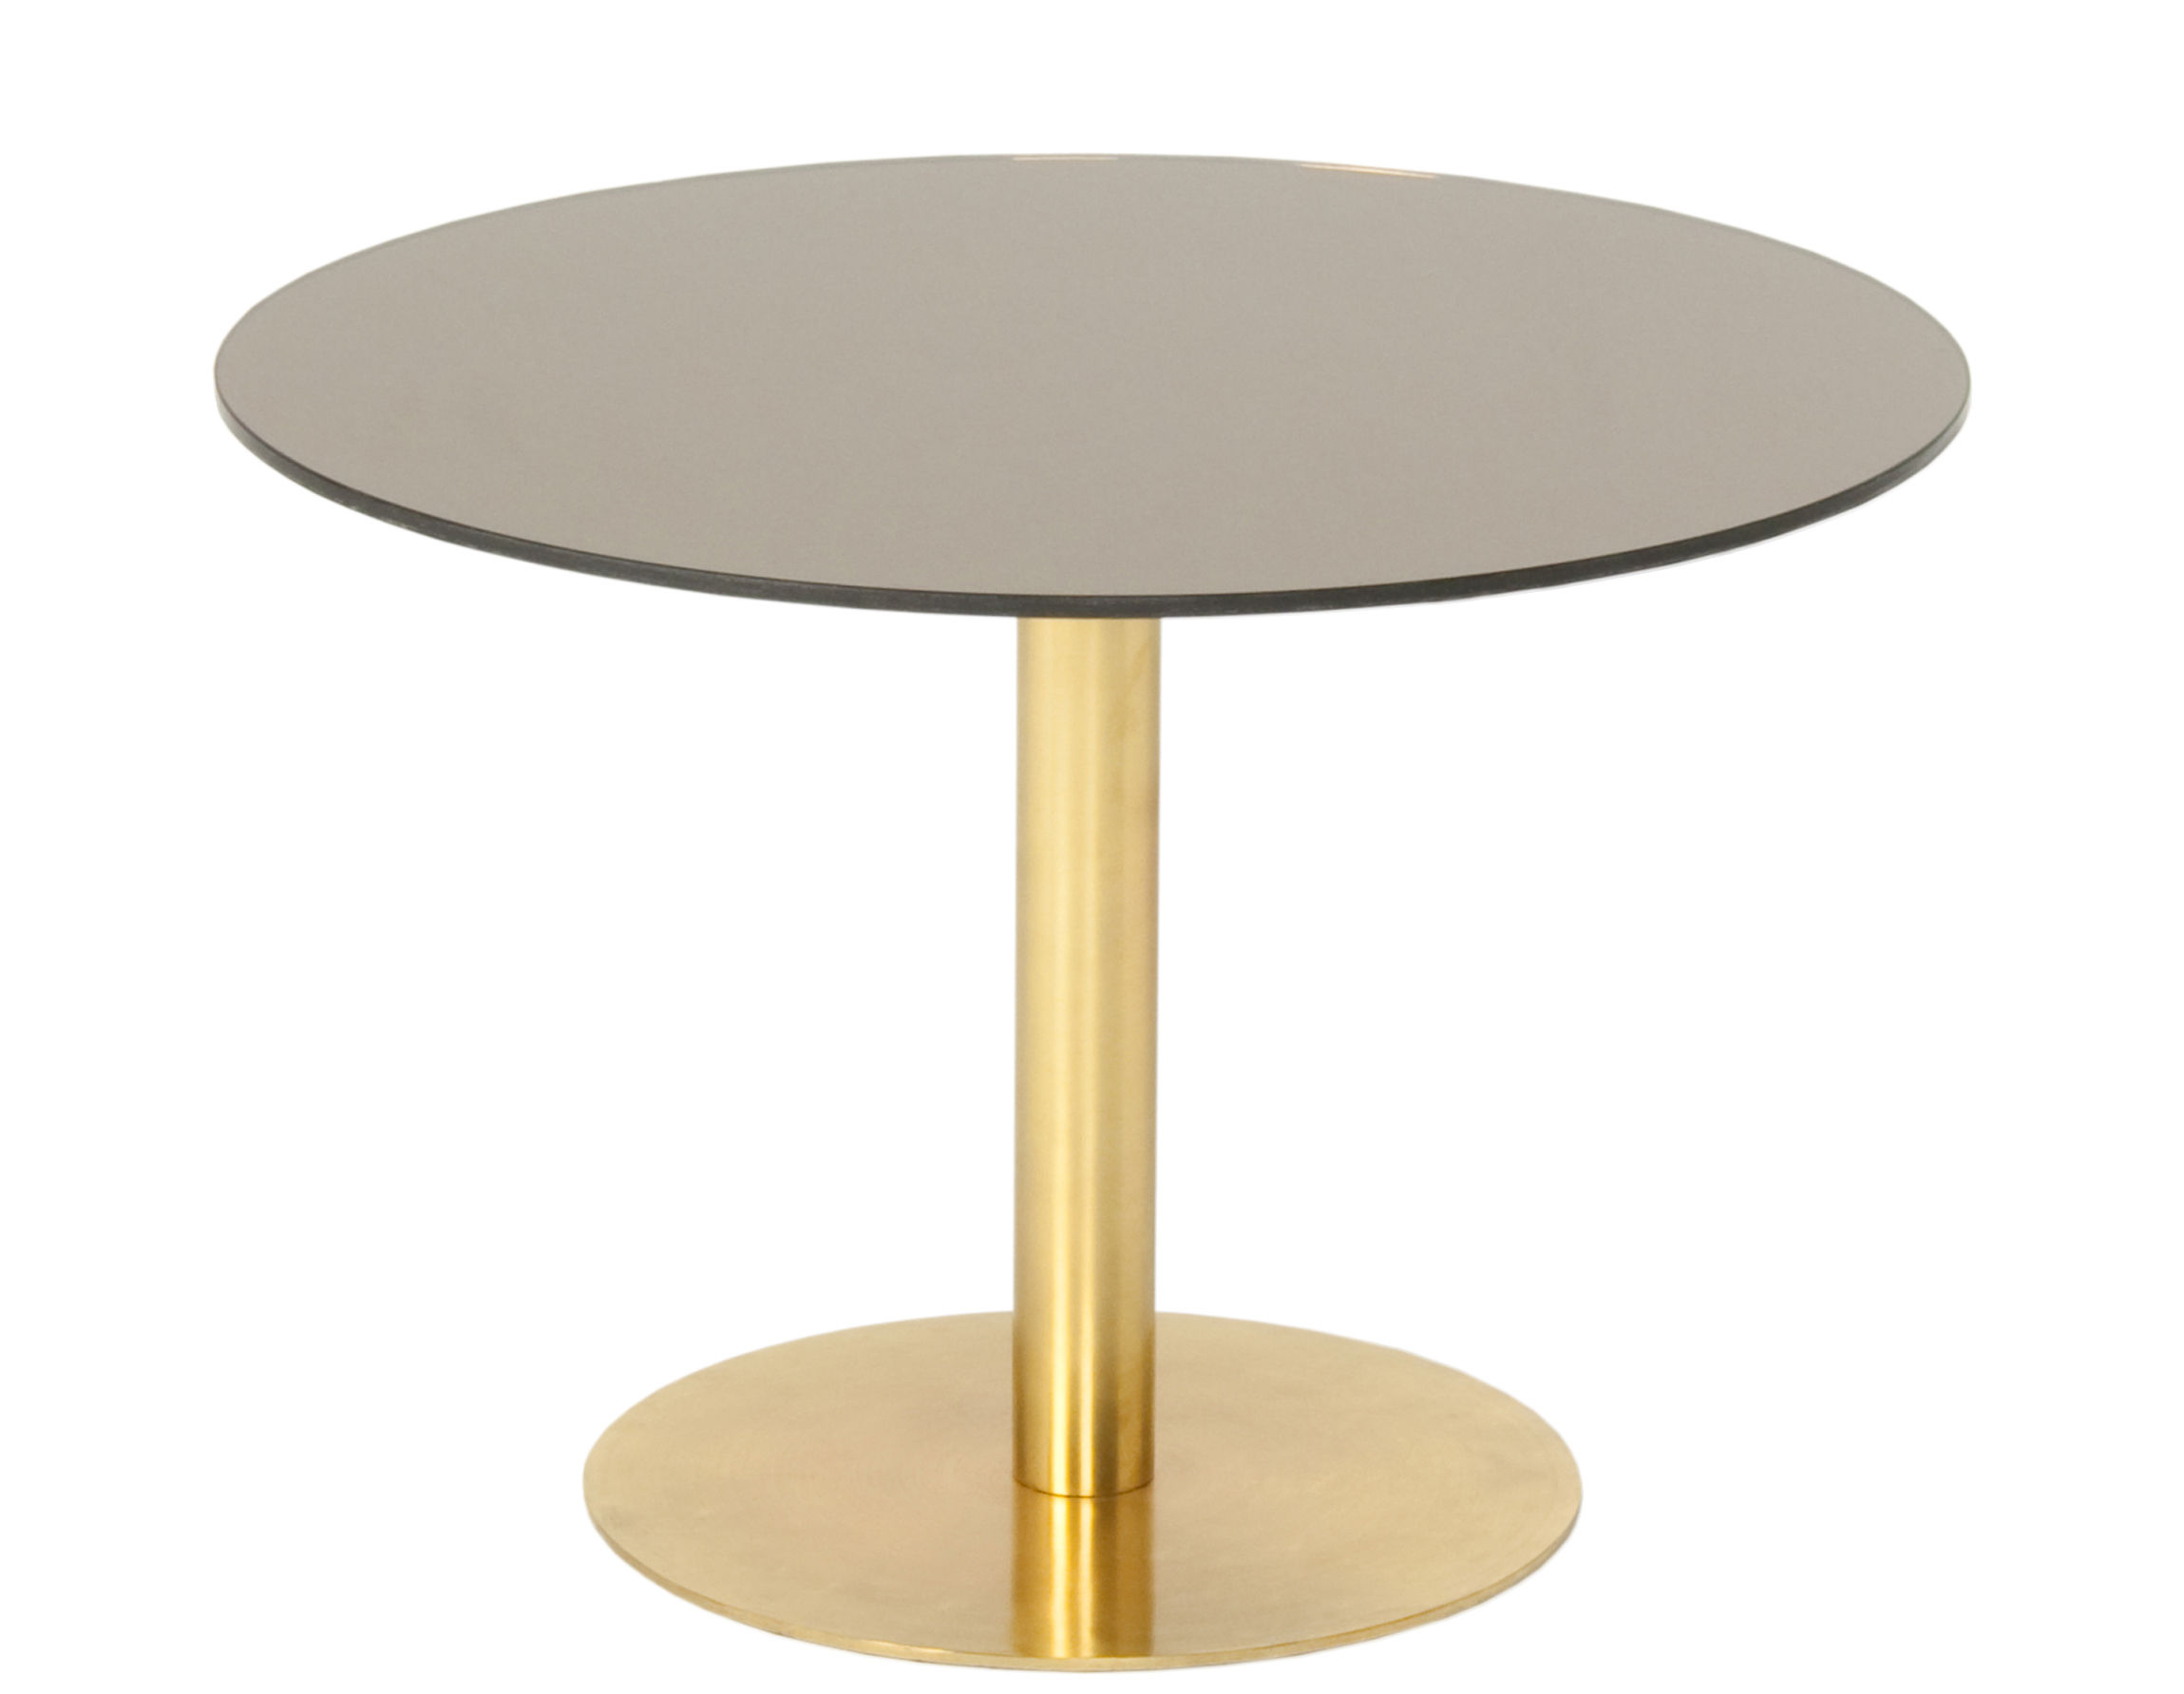 mobilier tables basses table basse flash o 60 cm tom dixon